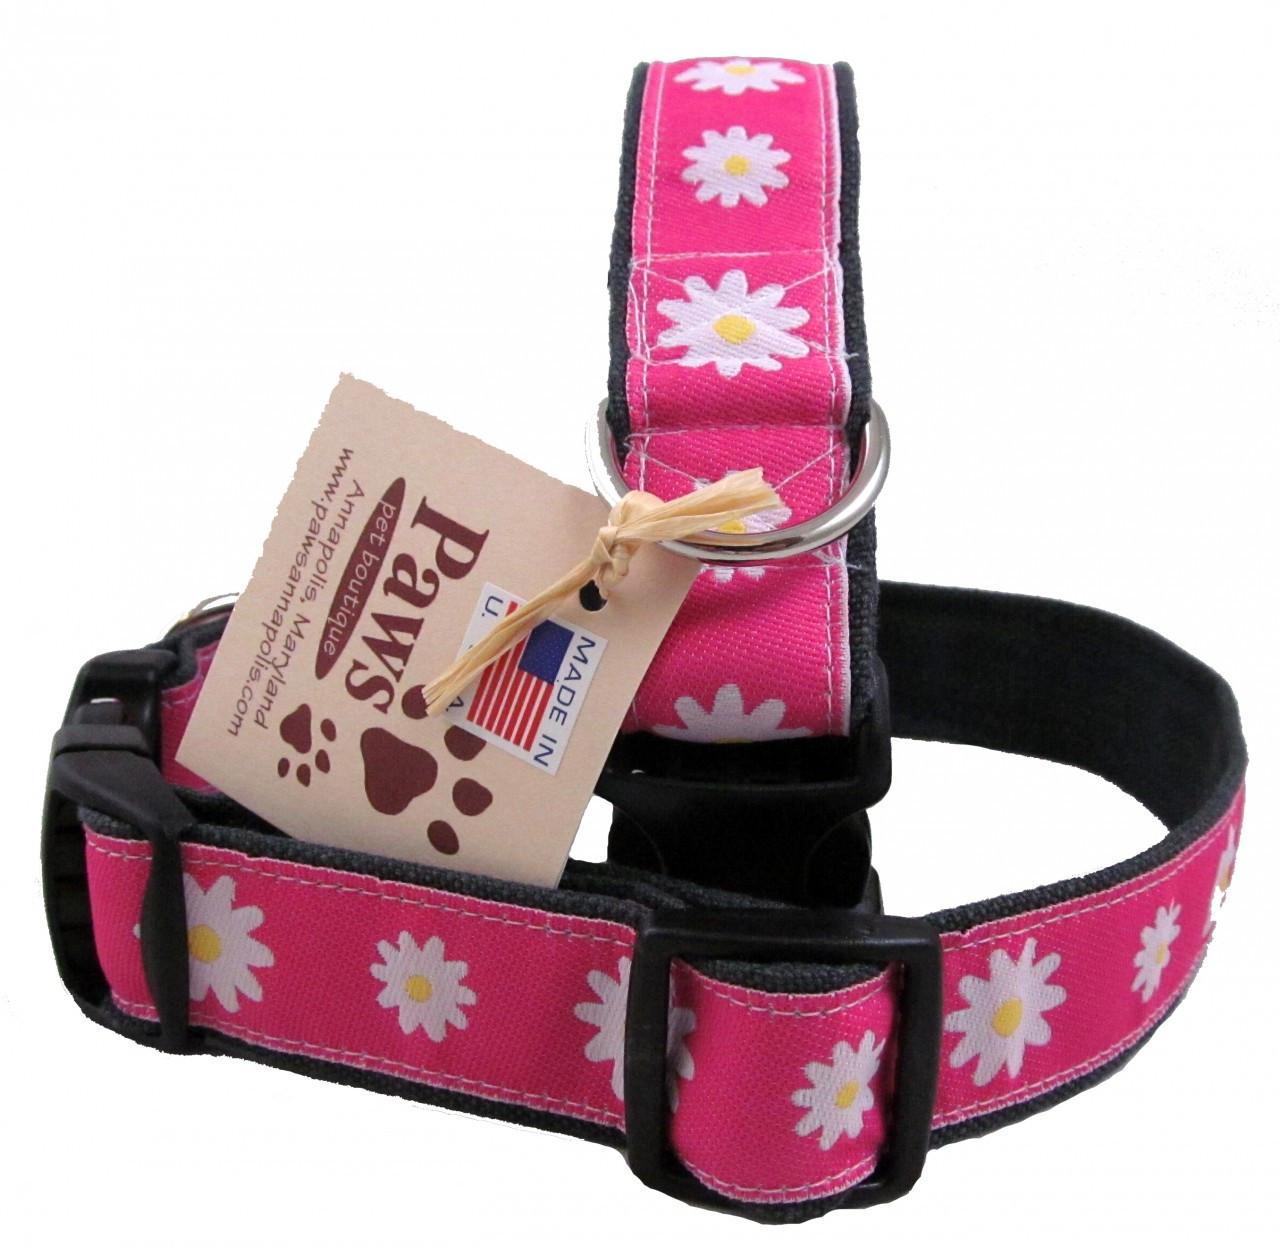 fcb3ac84a33 White Daisies Pop on these Pink Ribbon Hemp Dog Collars